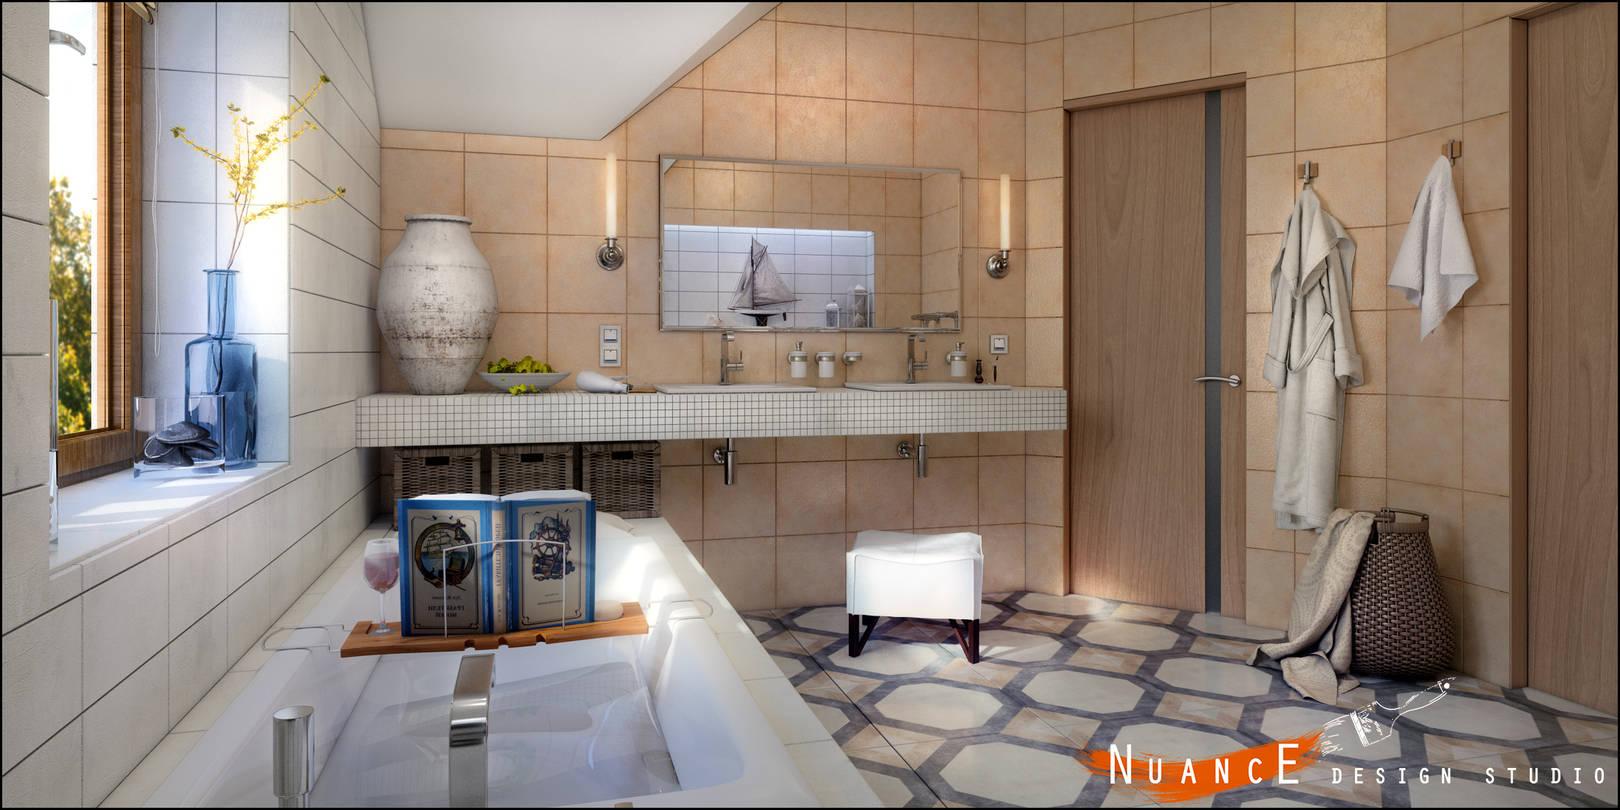 душевая комната в частном доме дизайн фото